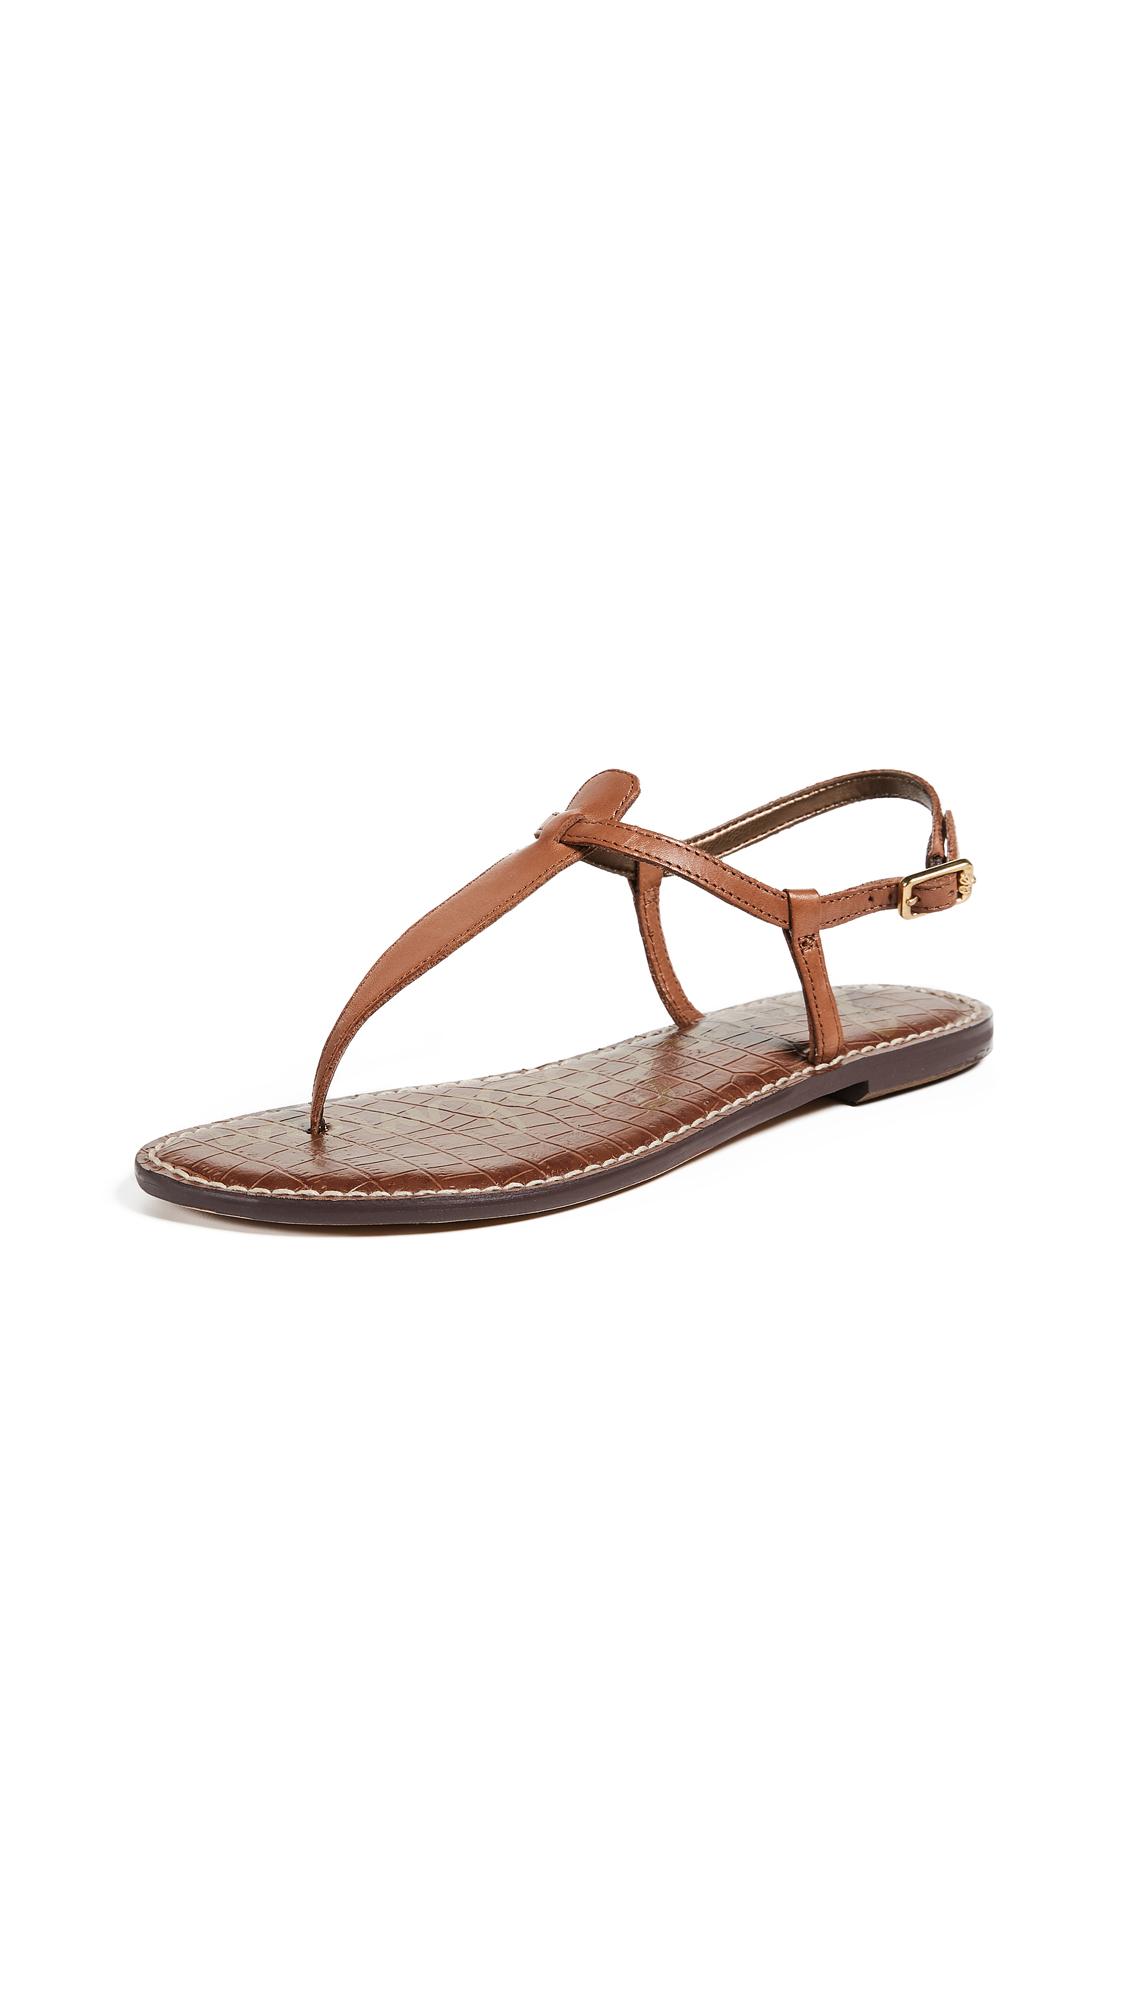 Photo of Sam Edelman Gigi Flat Sandals - buy Sam Edelman shoes